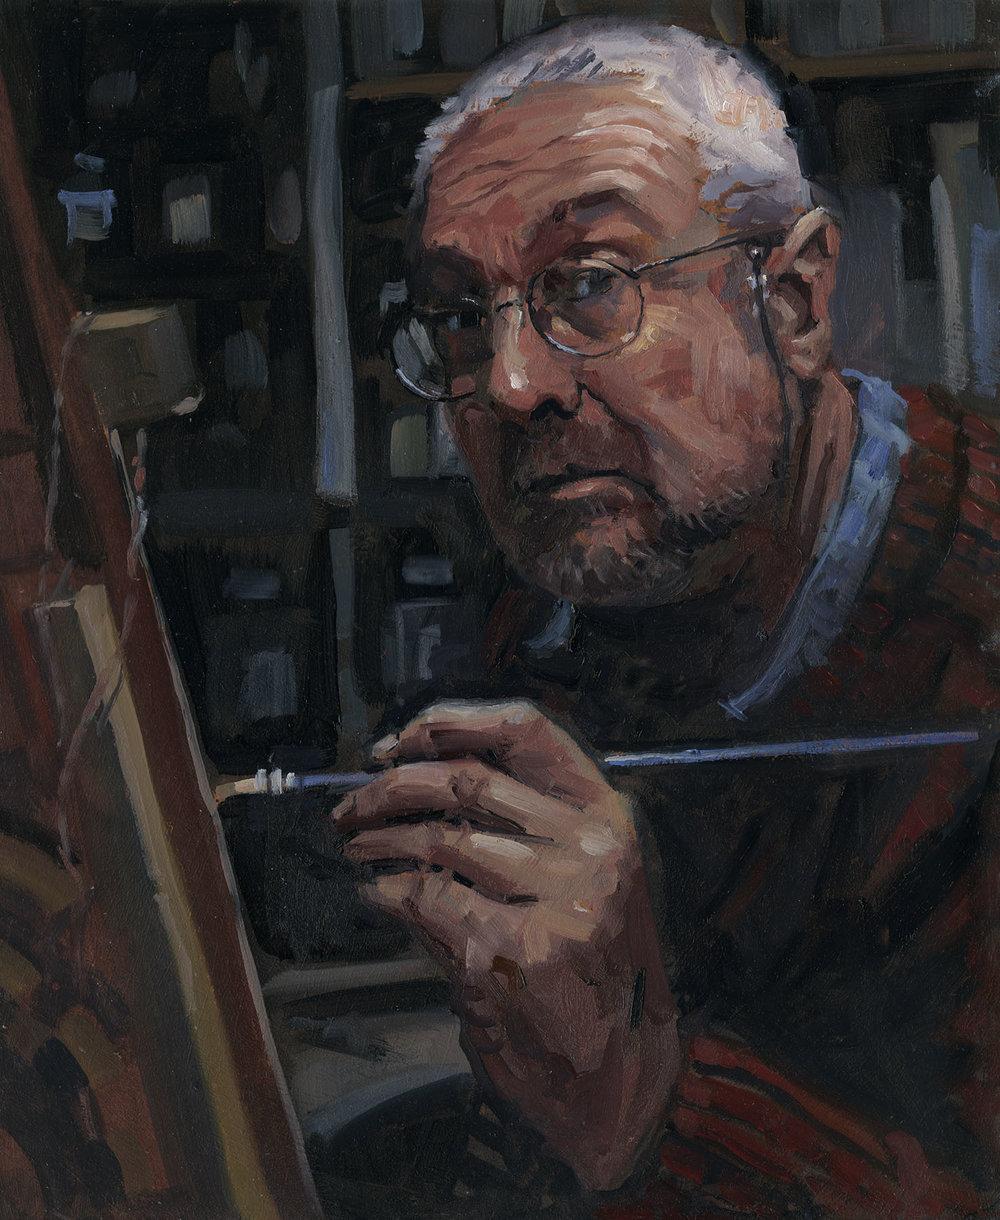 Rob Adams, The Painter, Oils, 30cm x 36width cm x 0.3depth cm,  http://www.treeshark.com/treeblog/